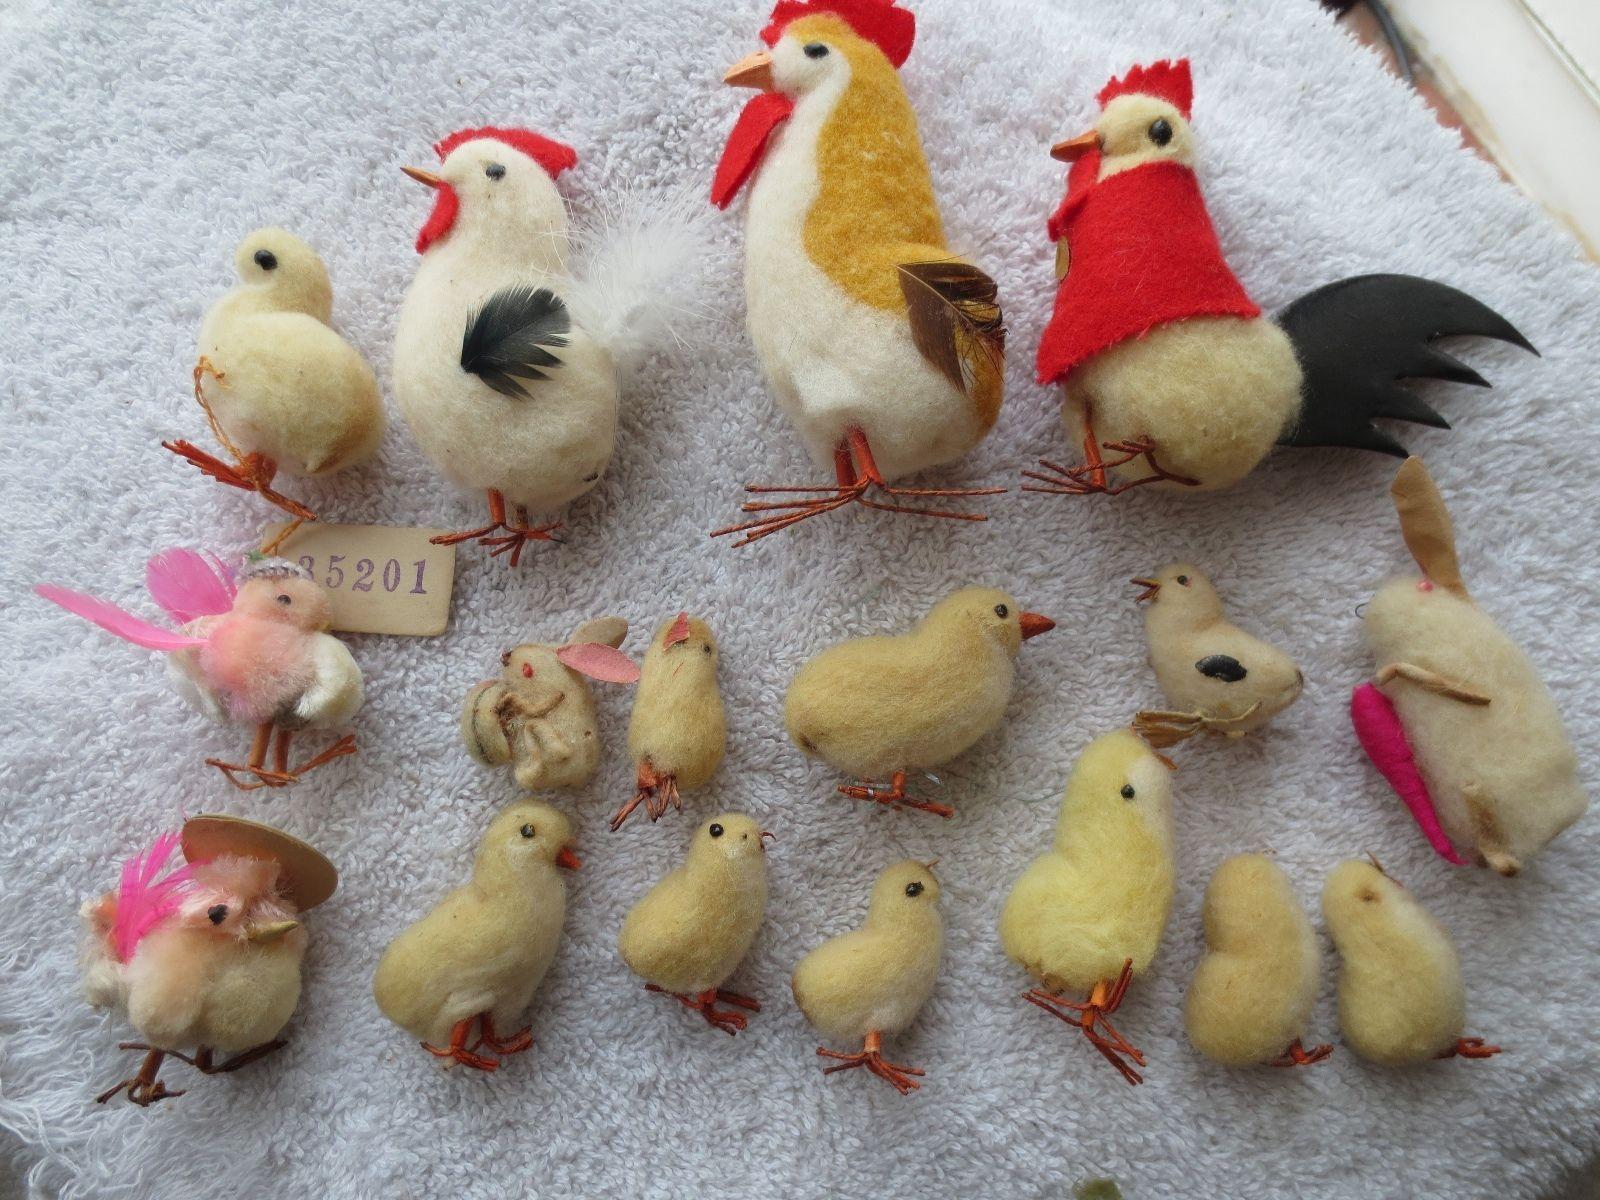 Chicken christmas ornaments - Antique Spun Cotton Christmas Ornaments Lot 17 Antique Spun Cotton Easter Chicks Ebay